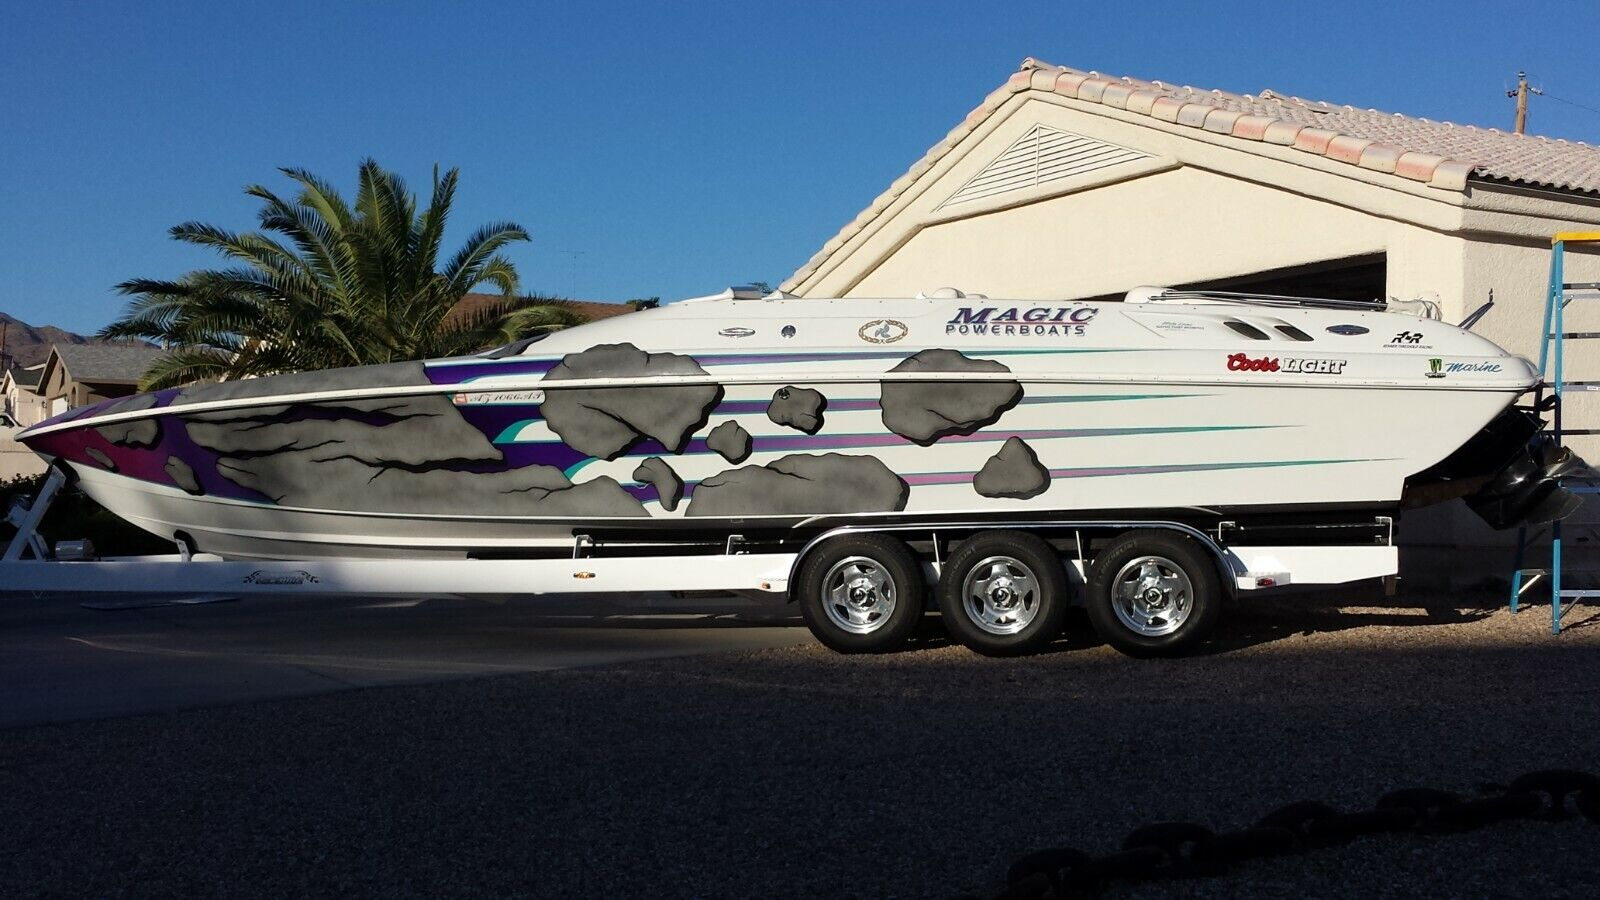 MAGIC 34 ft Sorcerer Power Boat,Fountain,Cigarette Hallett Baja,scarab